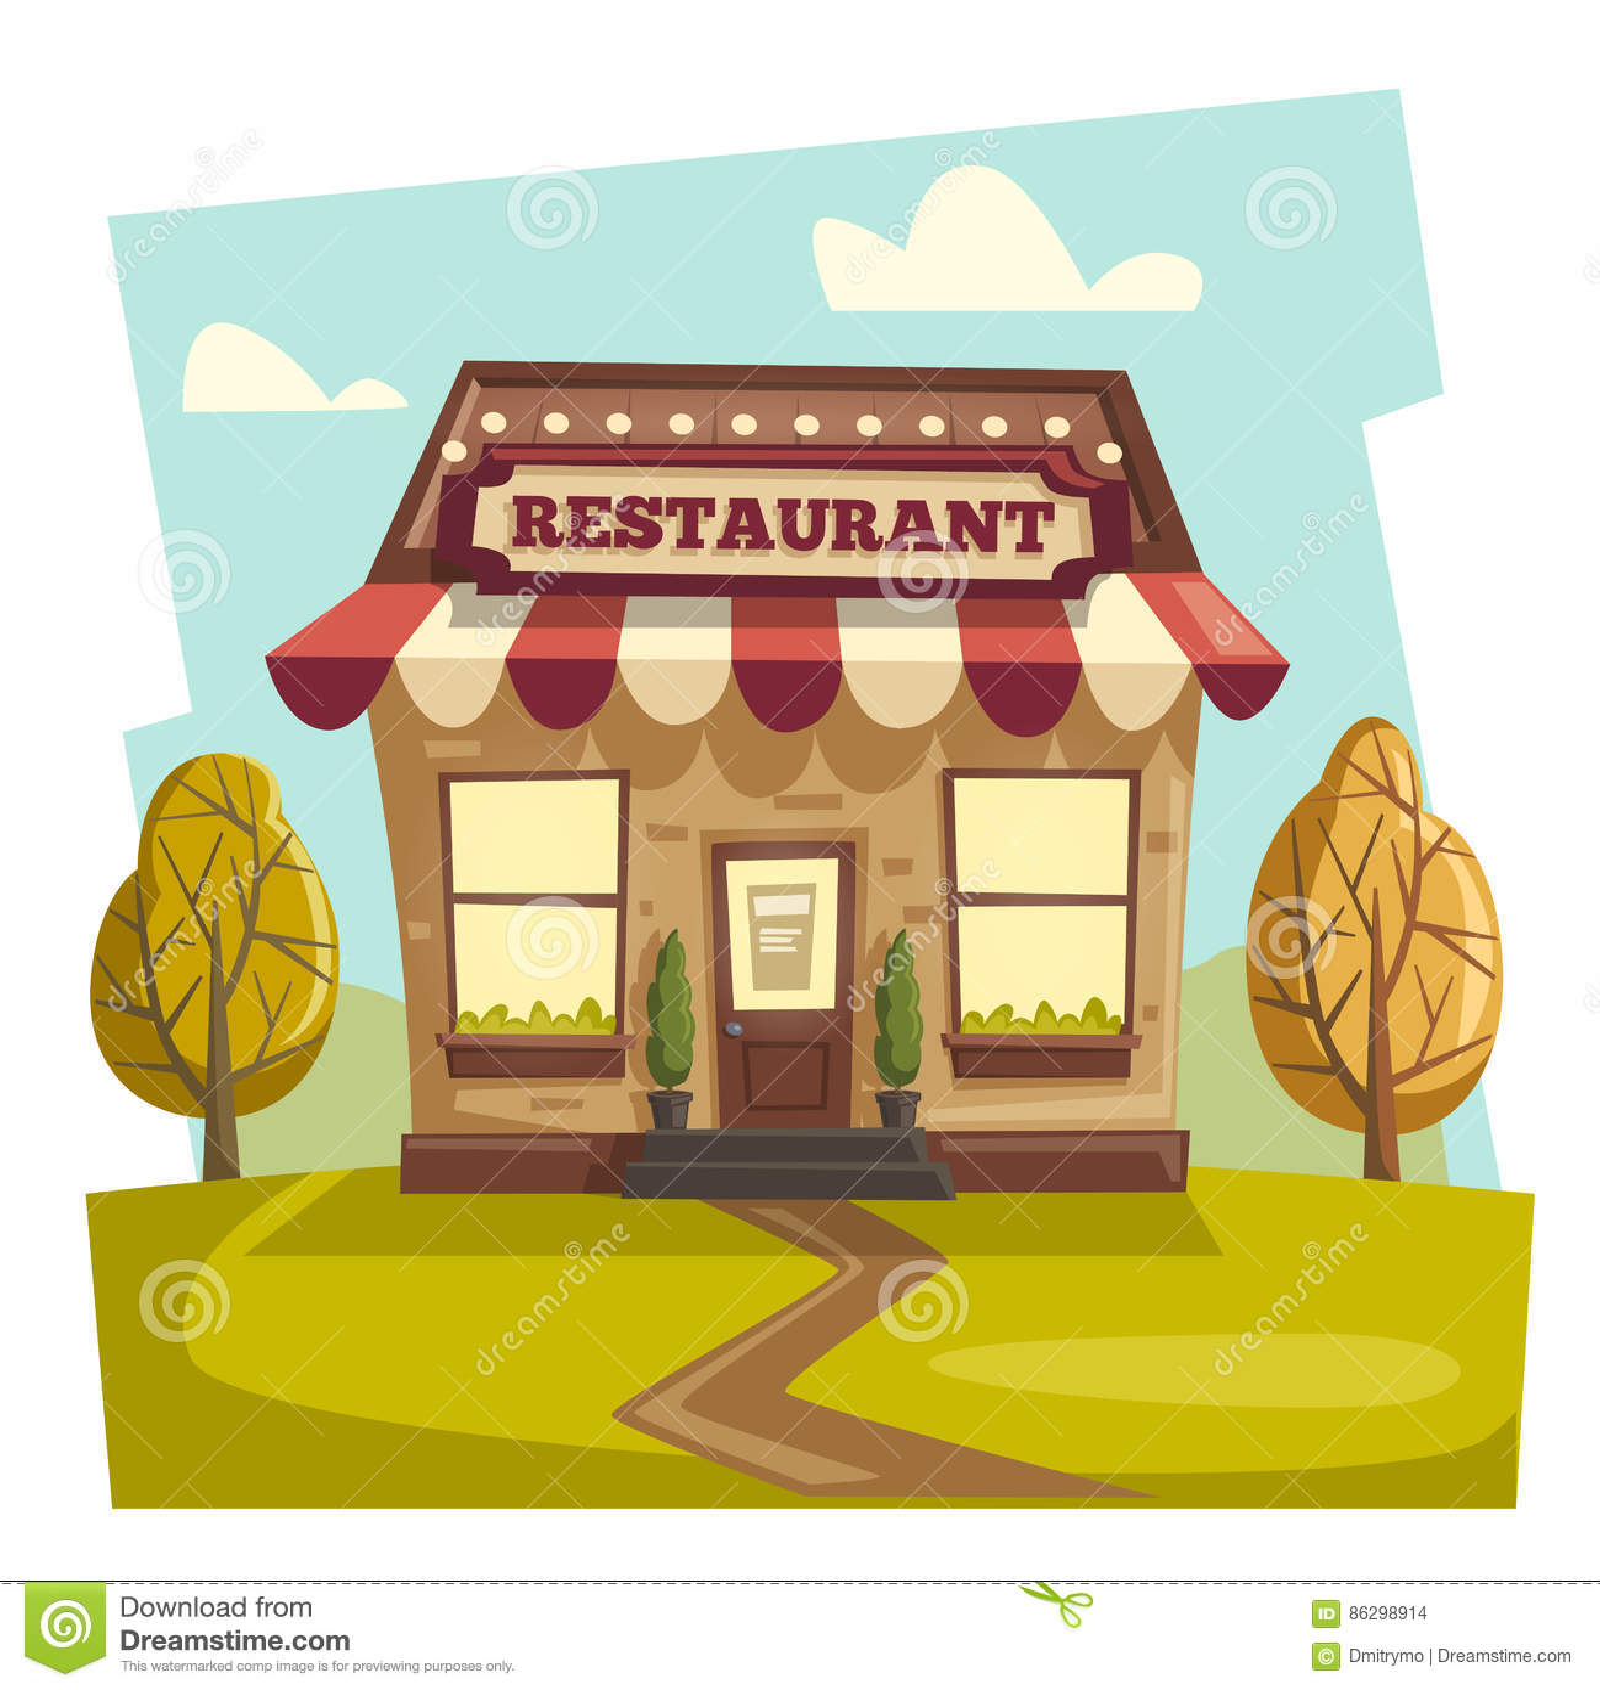 Cartoon restaurant free vector graphic download - Royalty Free Vector Building Cafe Cartoon